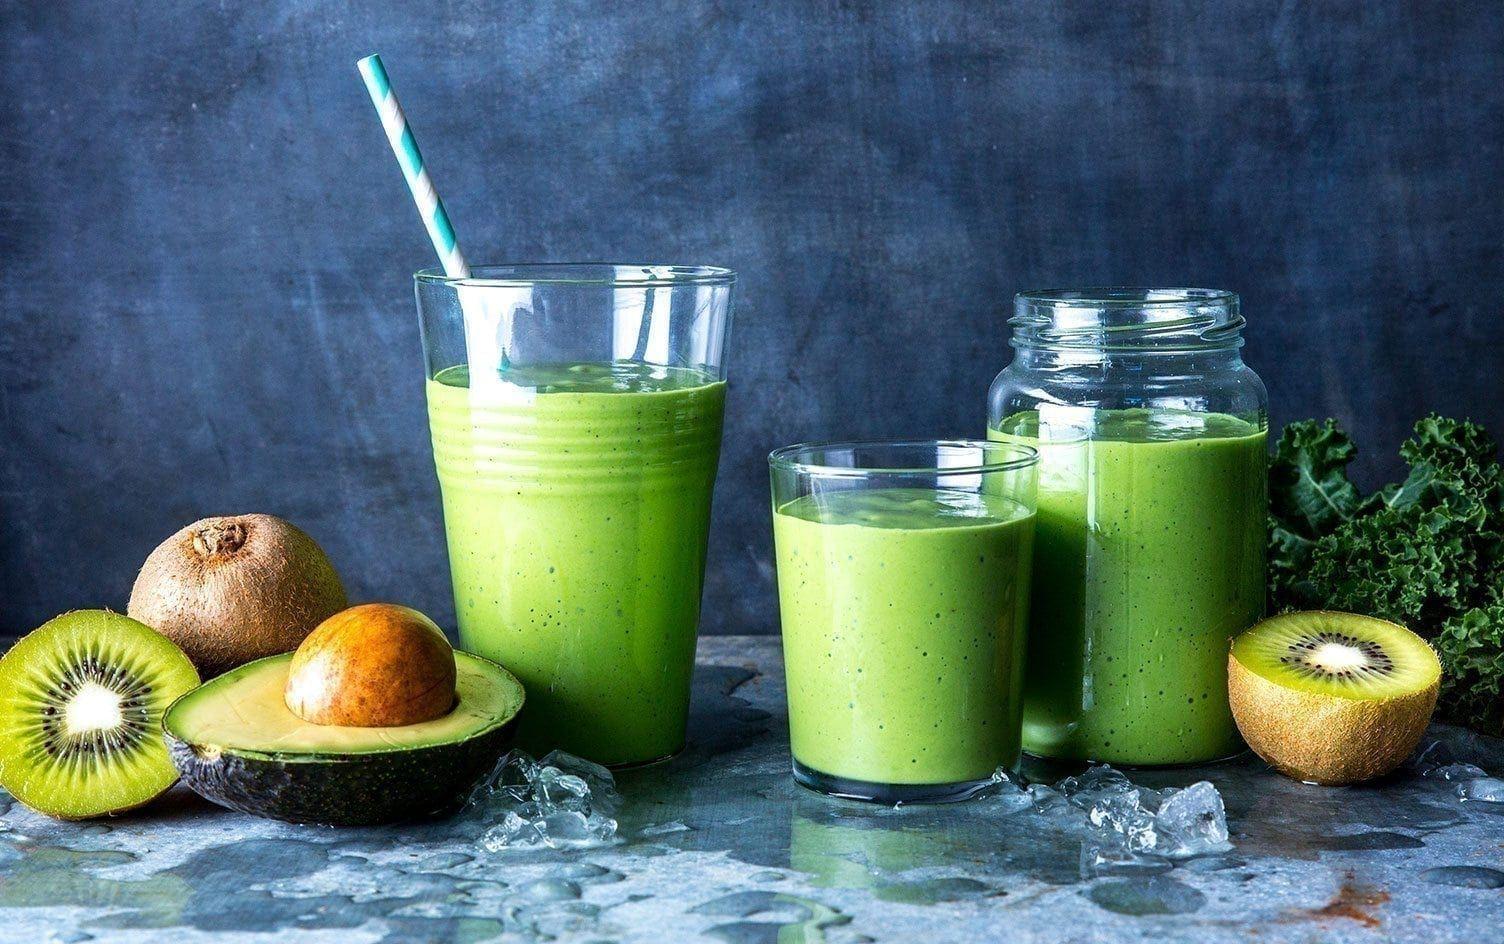 Avocado, Kale and Spinach Smoothie #myfitnesspalrecipes